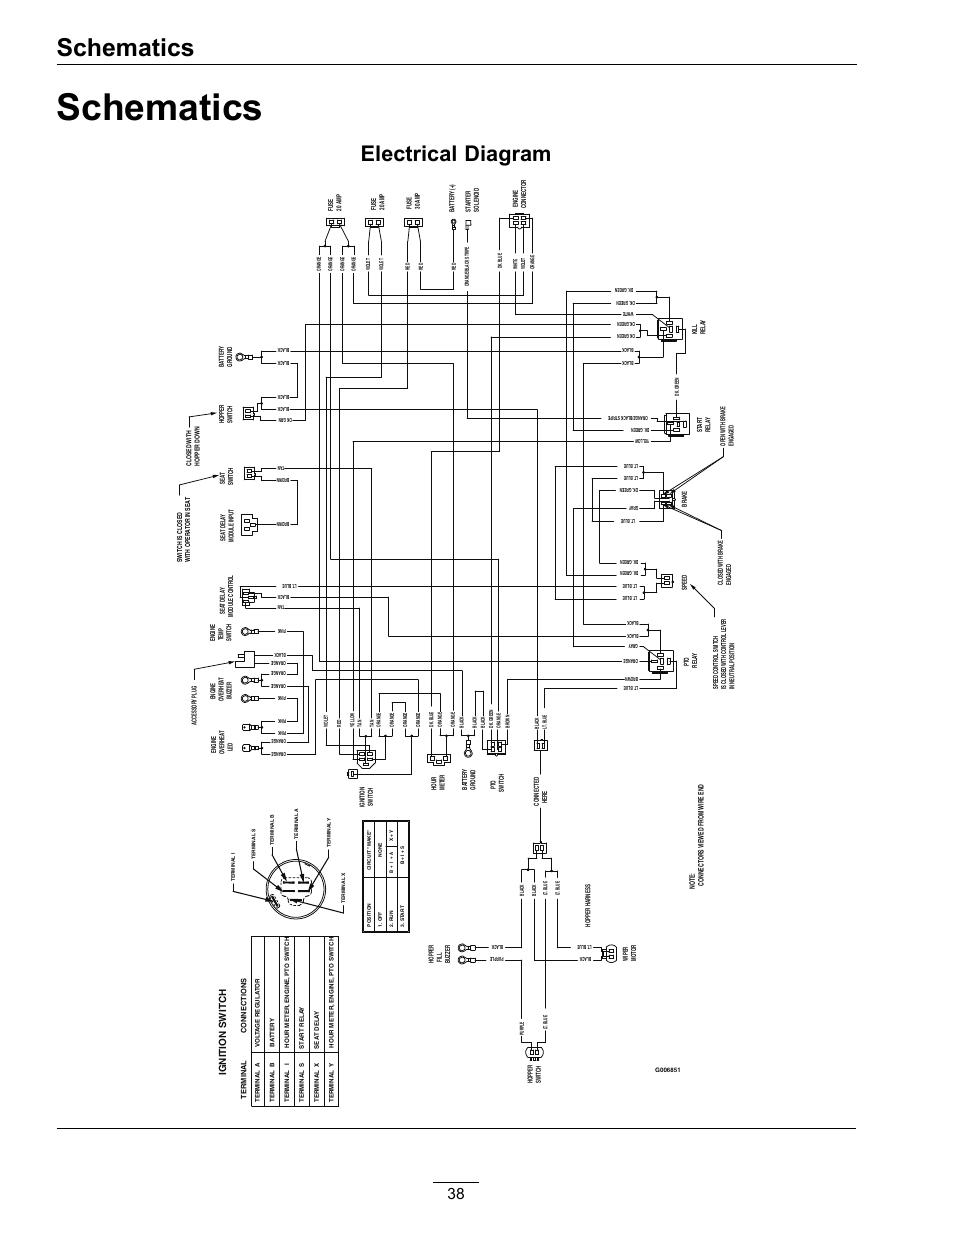 hight resolution of schematics electrical diagram exmark navigator 4500 367 user exmark electrical diagram